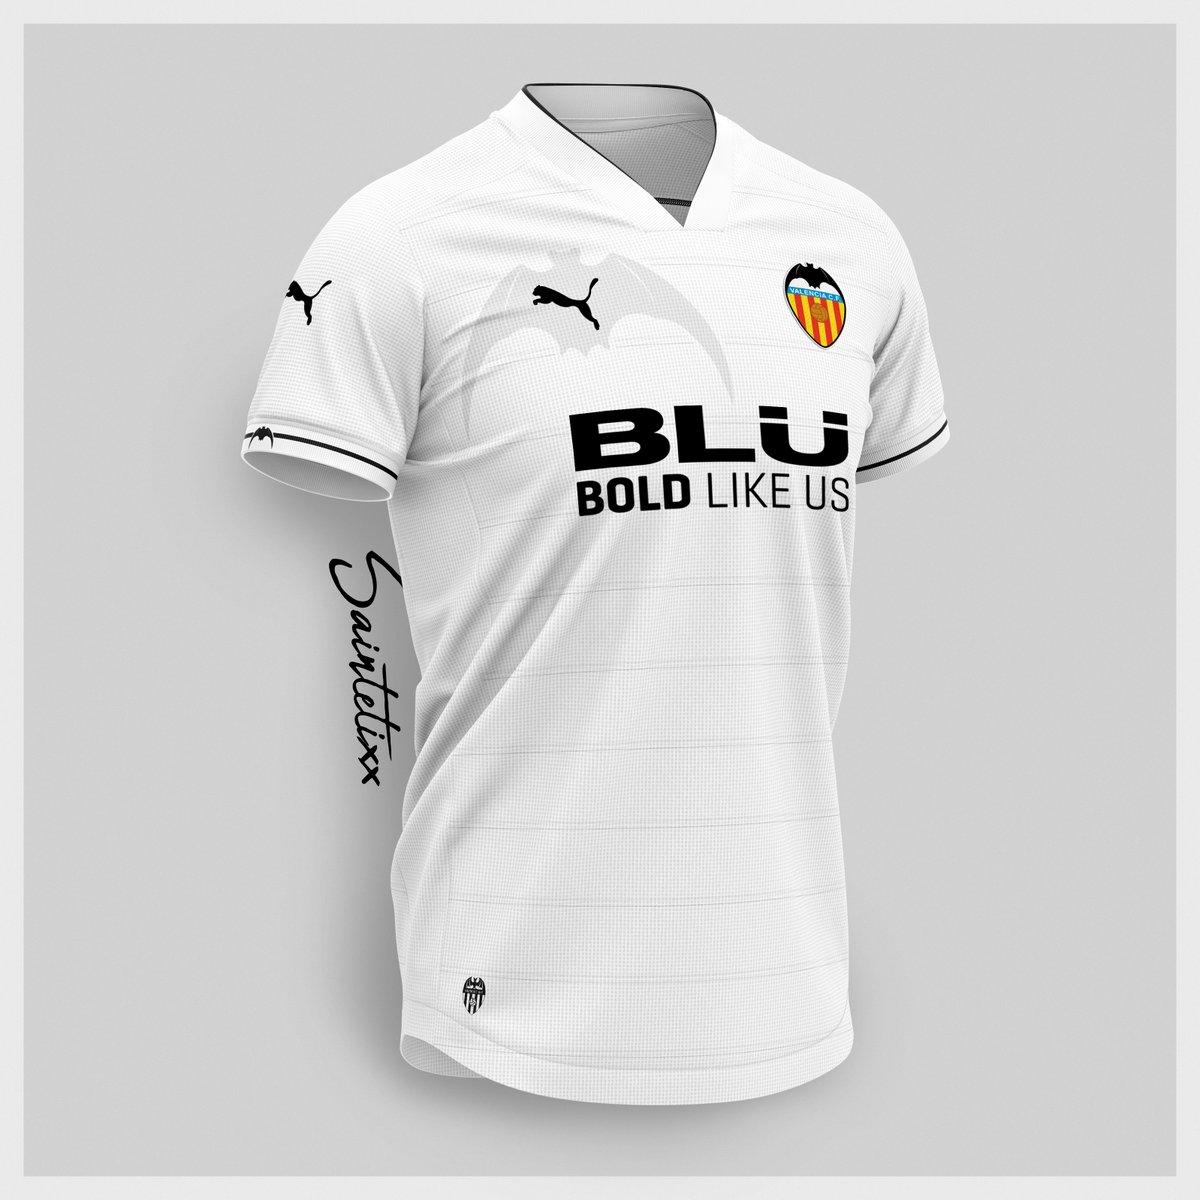 new arrival be366 999f9 No Leak Yet - Puma Valencia 19-20 Home, Away, Third ...